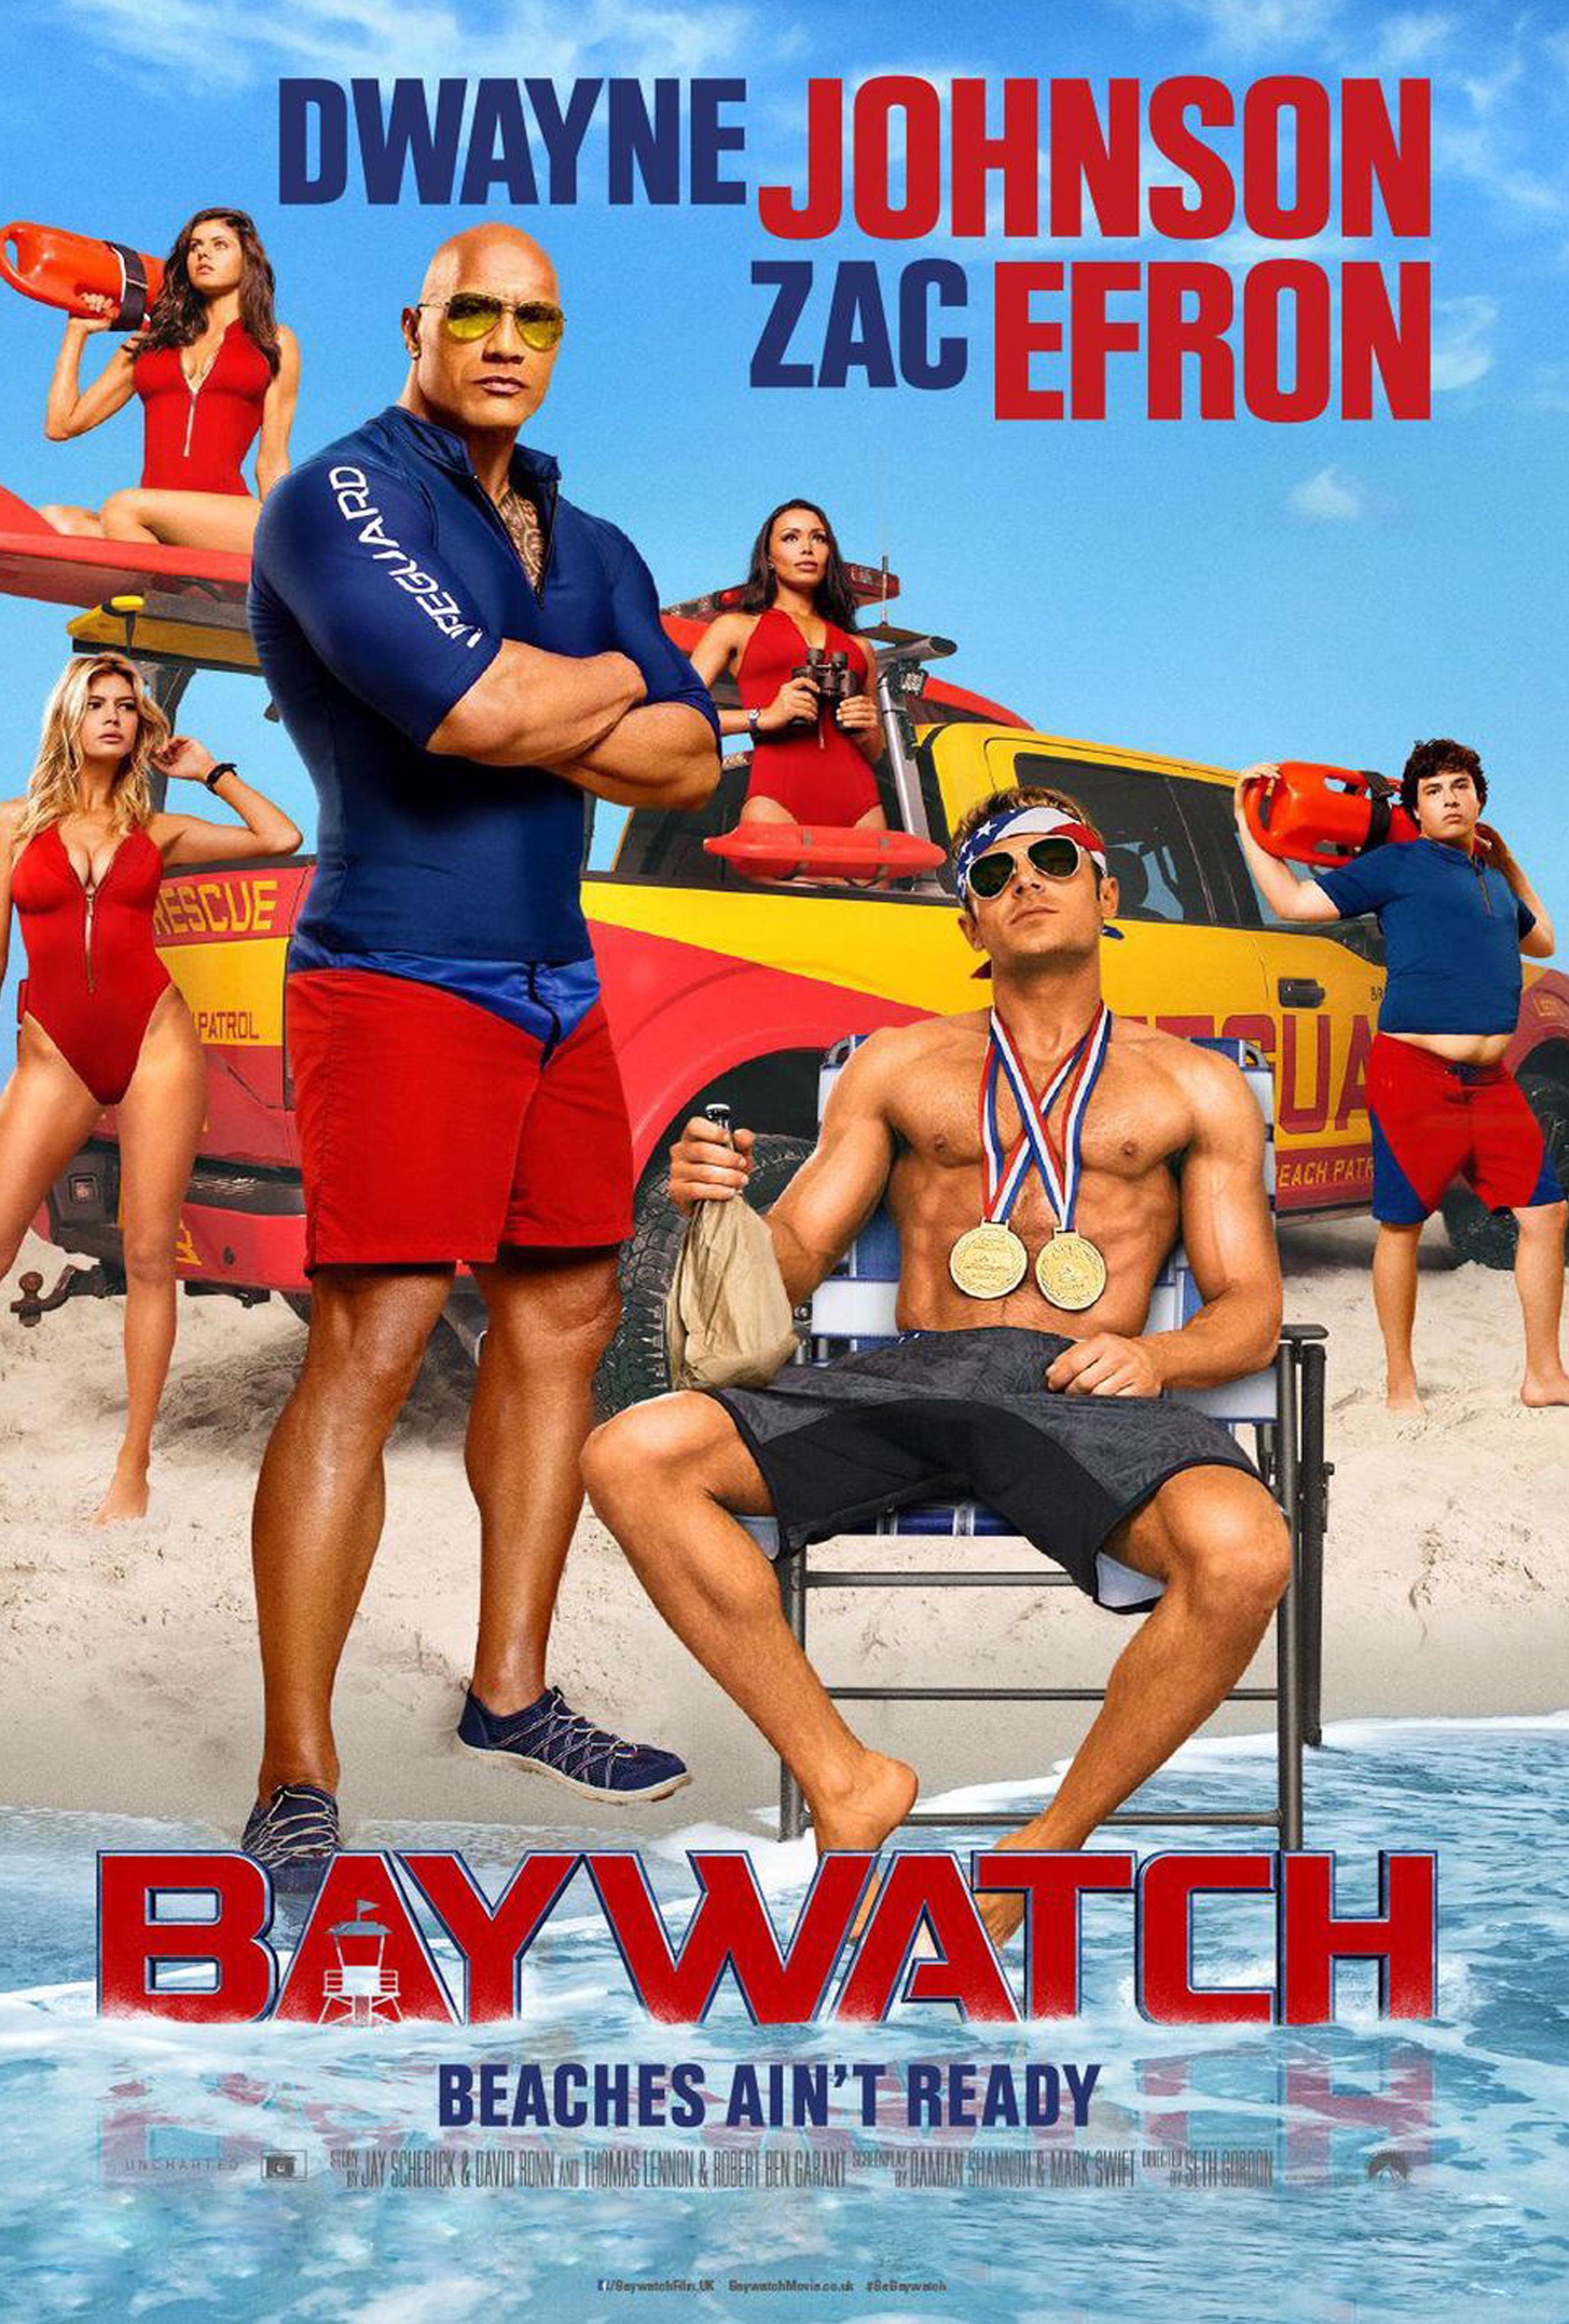 100% hd movie baywatch (2017) watch and free download | baywatch